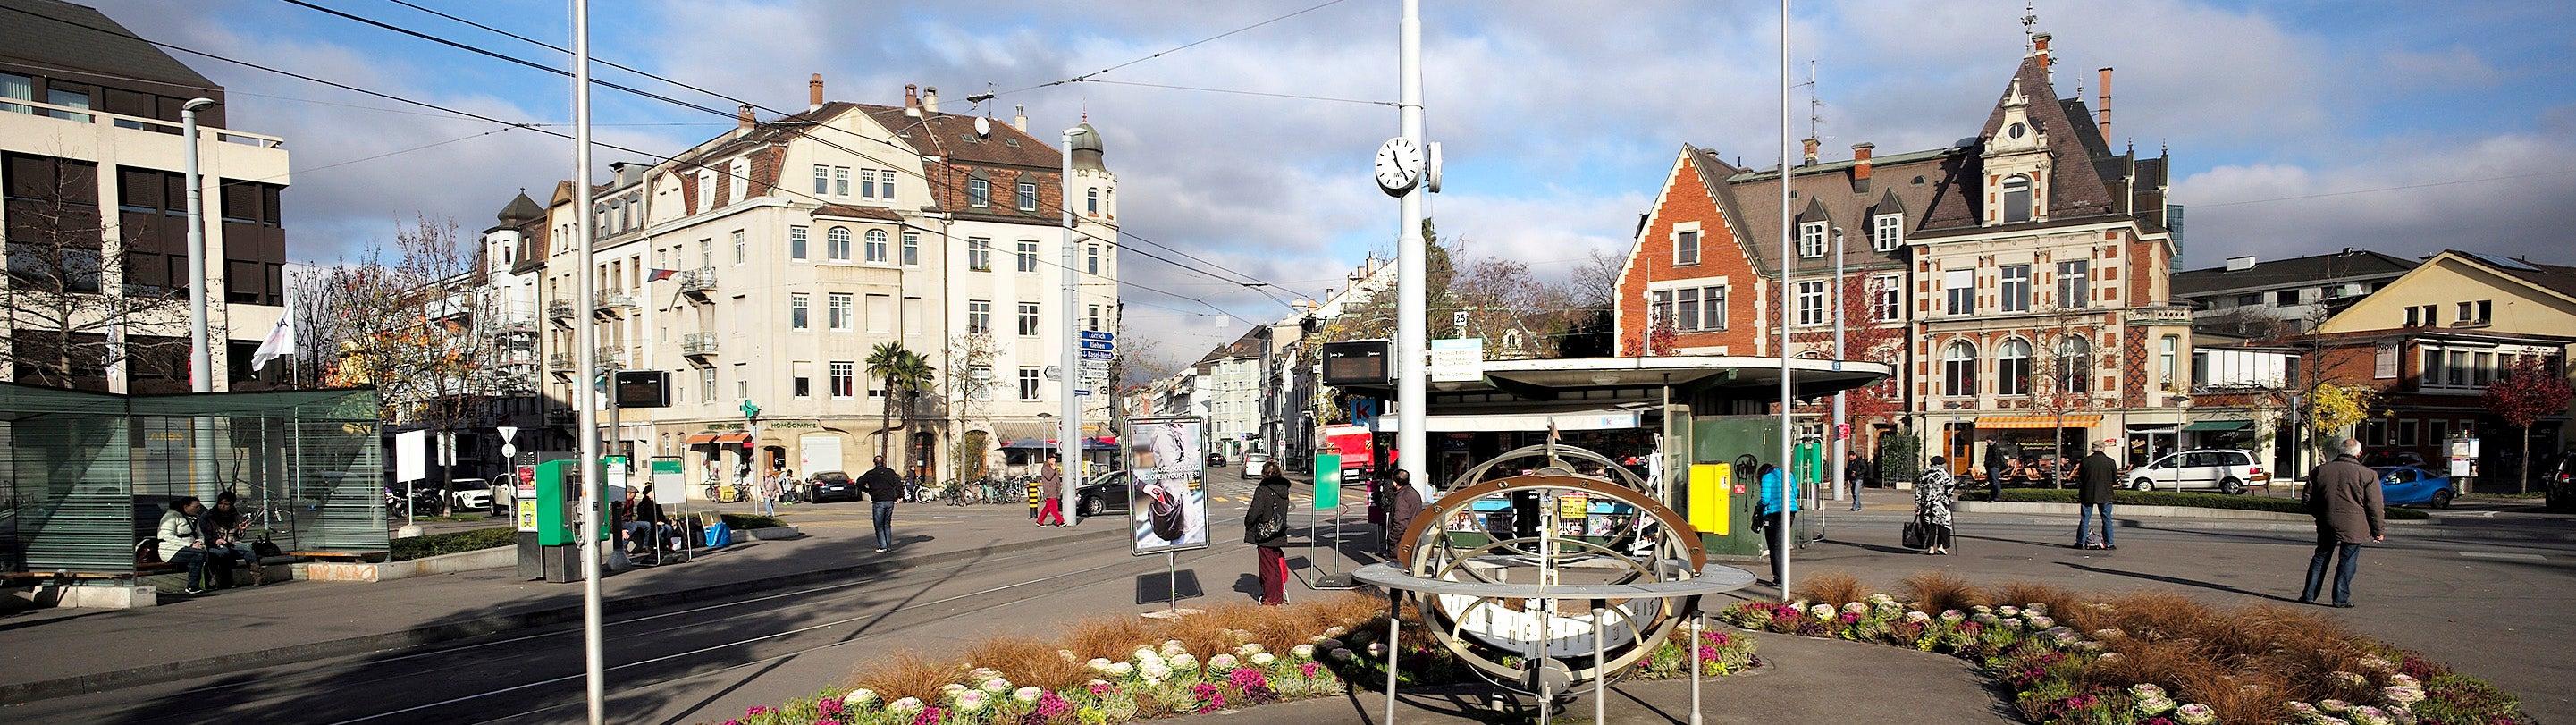 Basel, Wettstein